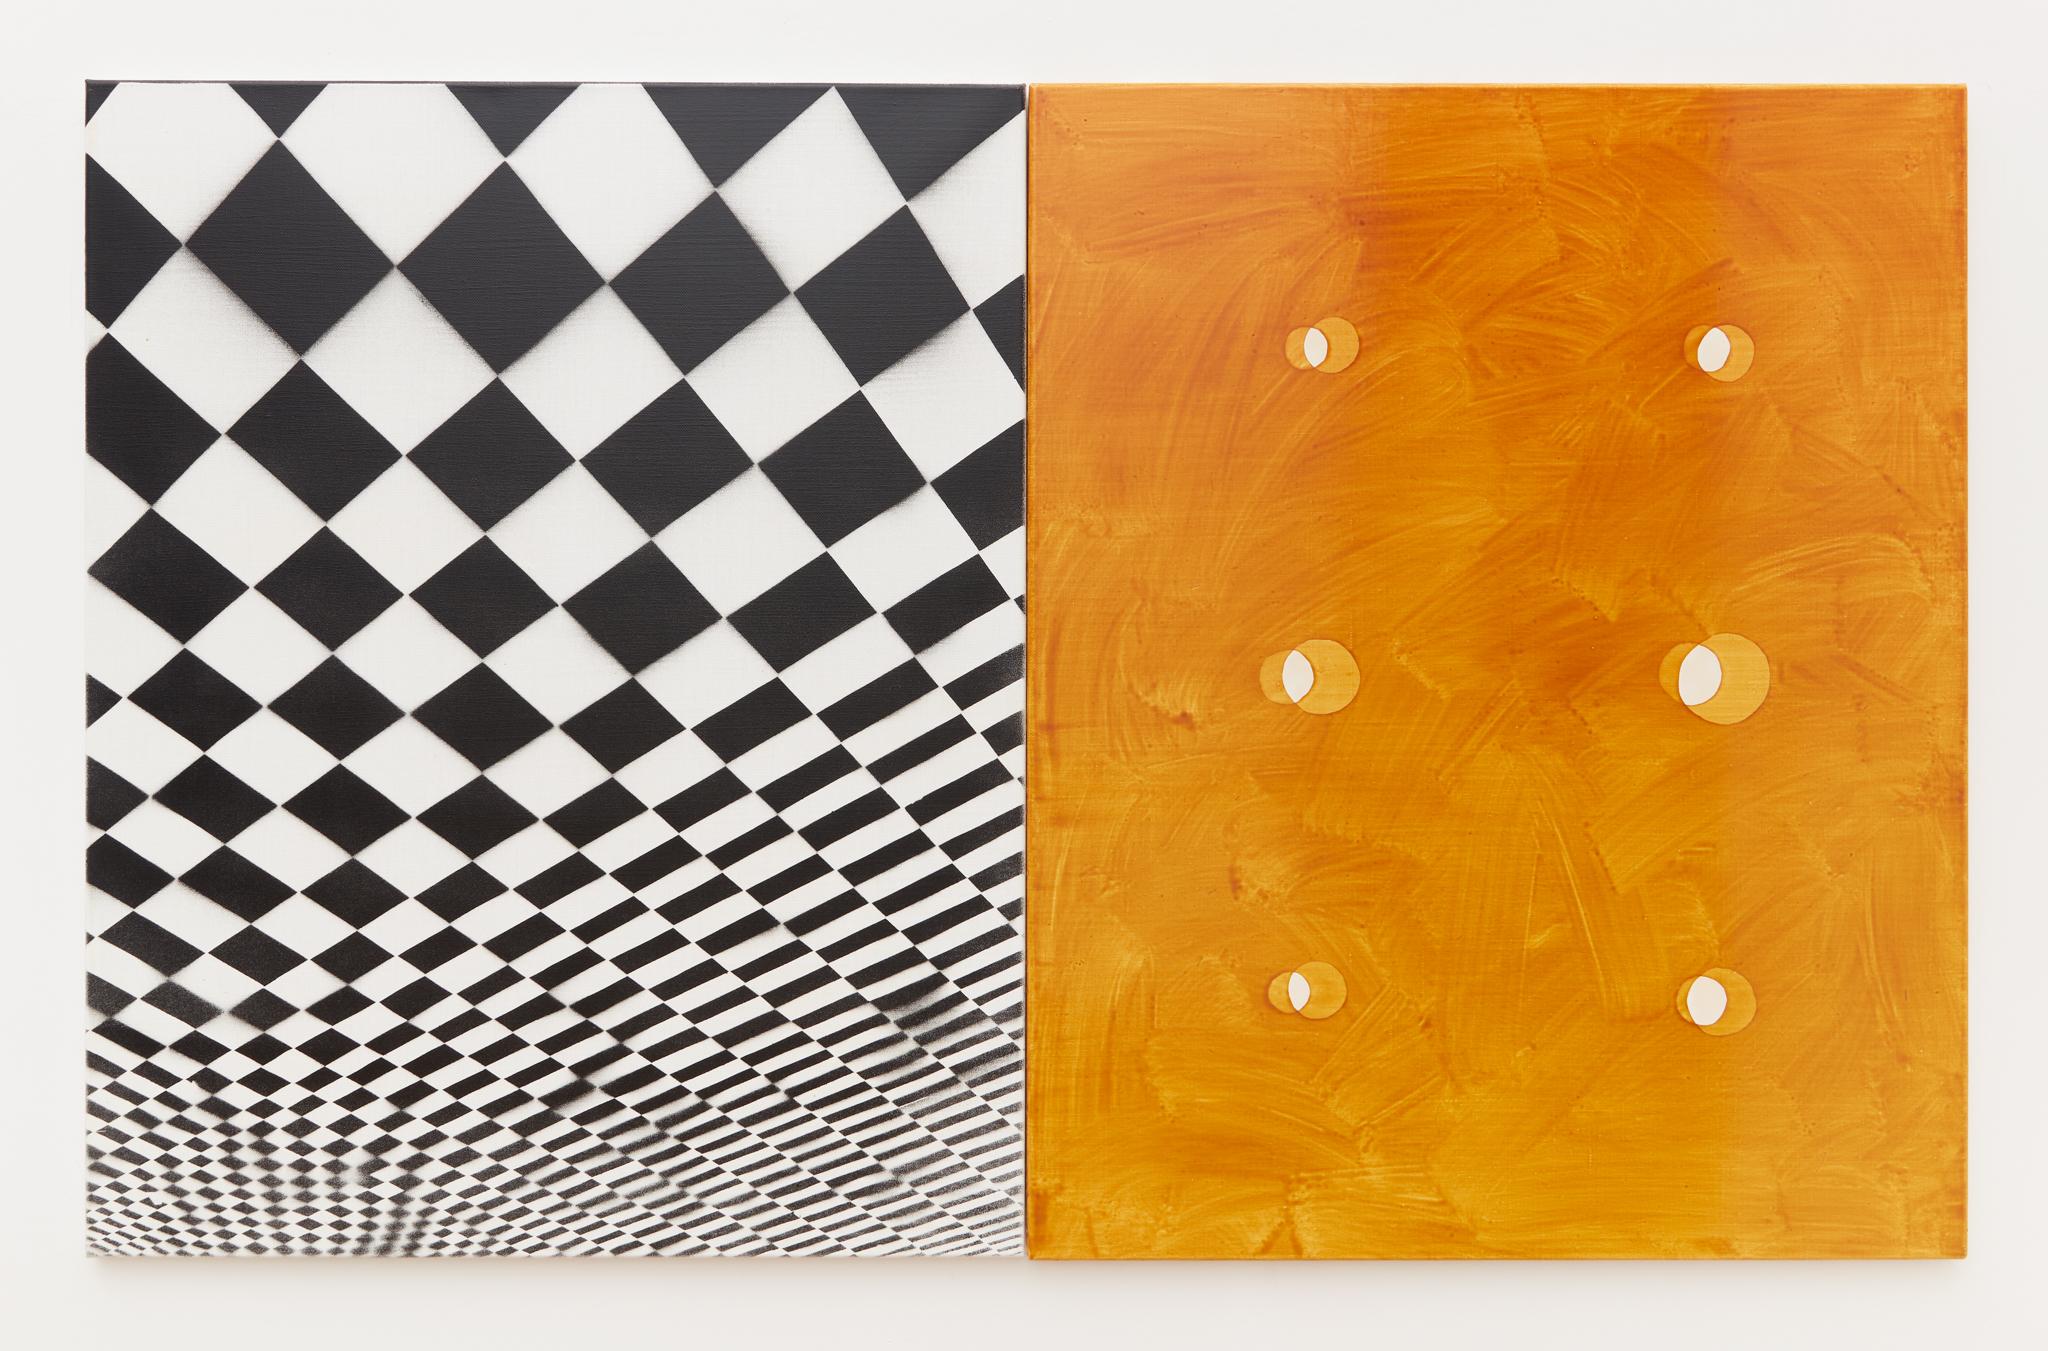 Rik Moens - 2 x Untitled, 2019